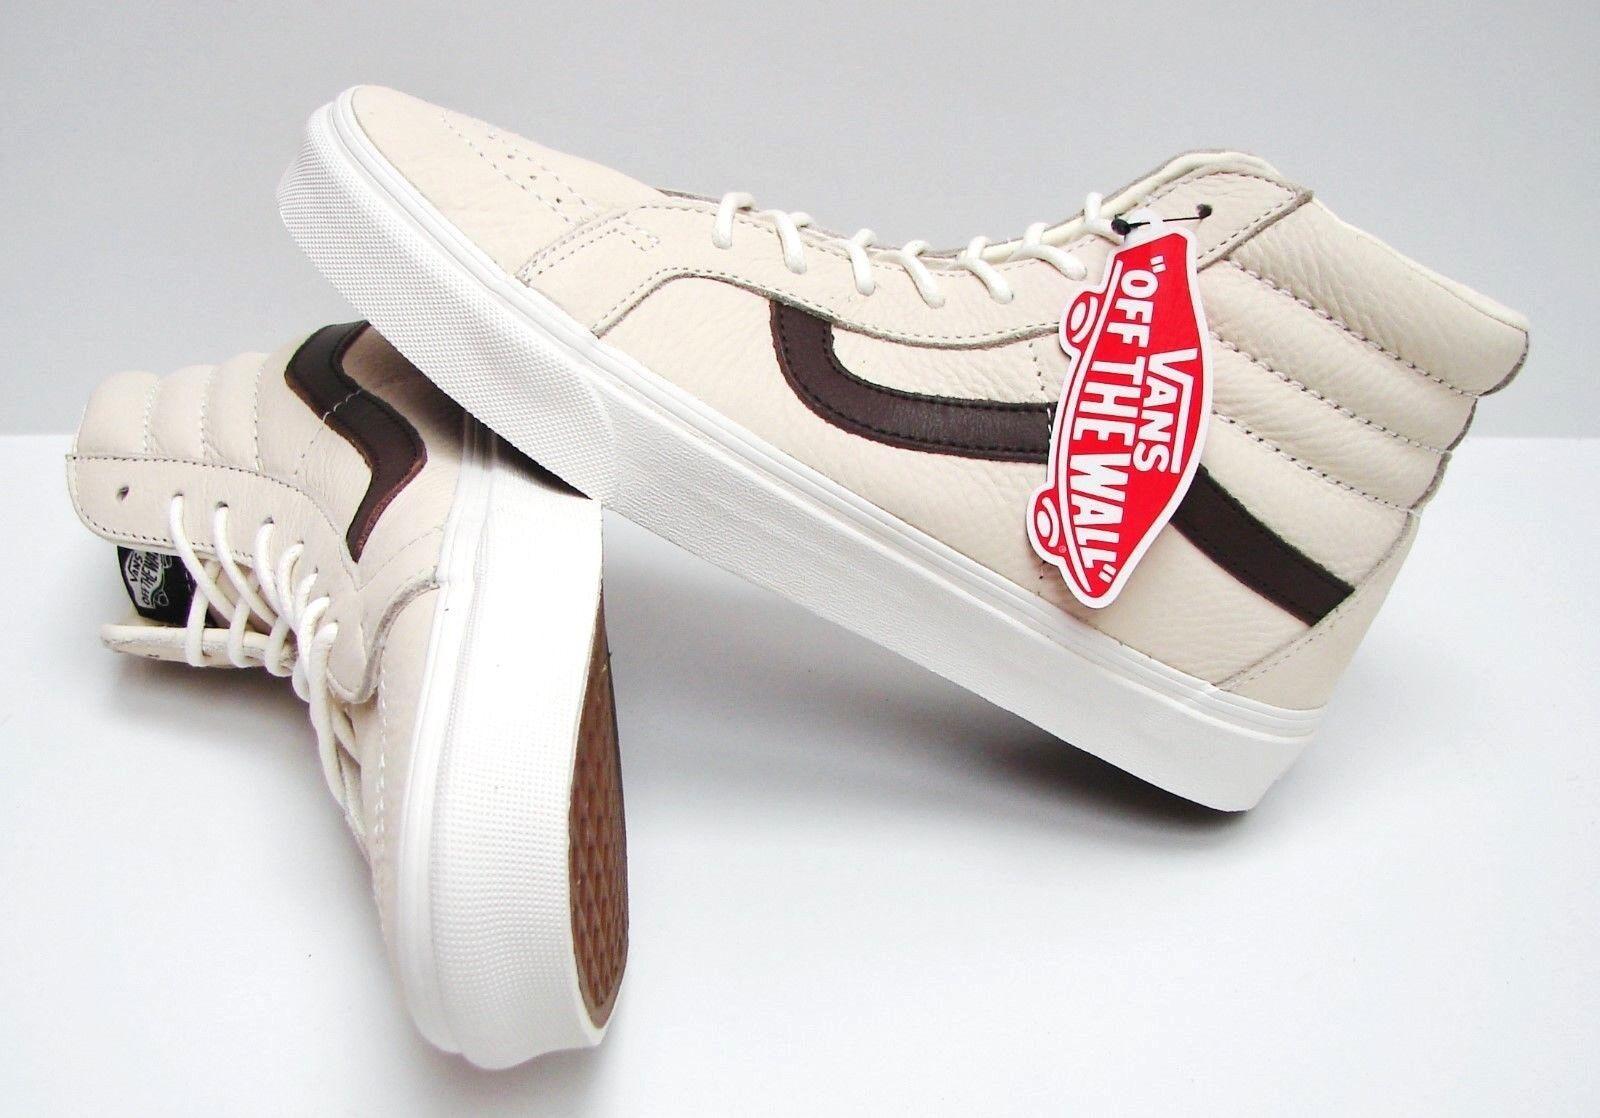 Vans SK8 Hi Reissue Leather white Potting Potting Potting Soil VN0A2XSBLYT Men's Size 8.5 7d2c31